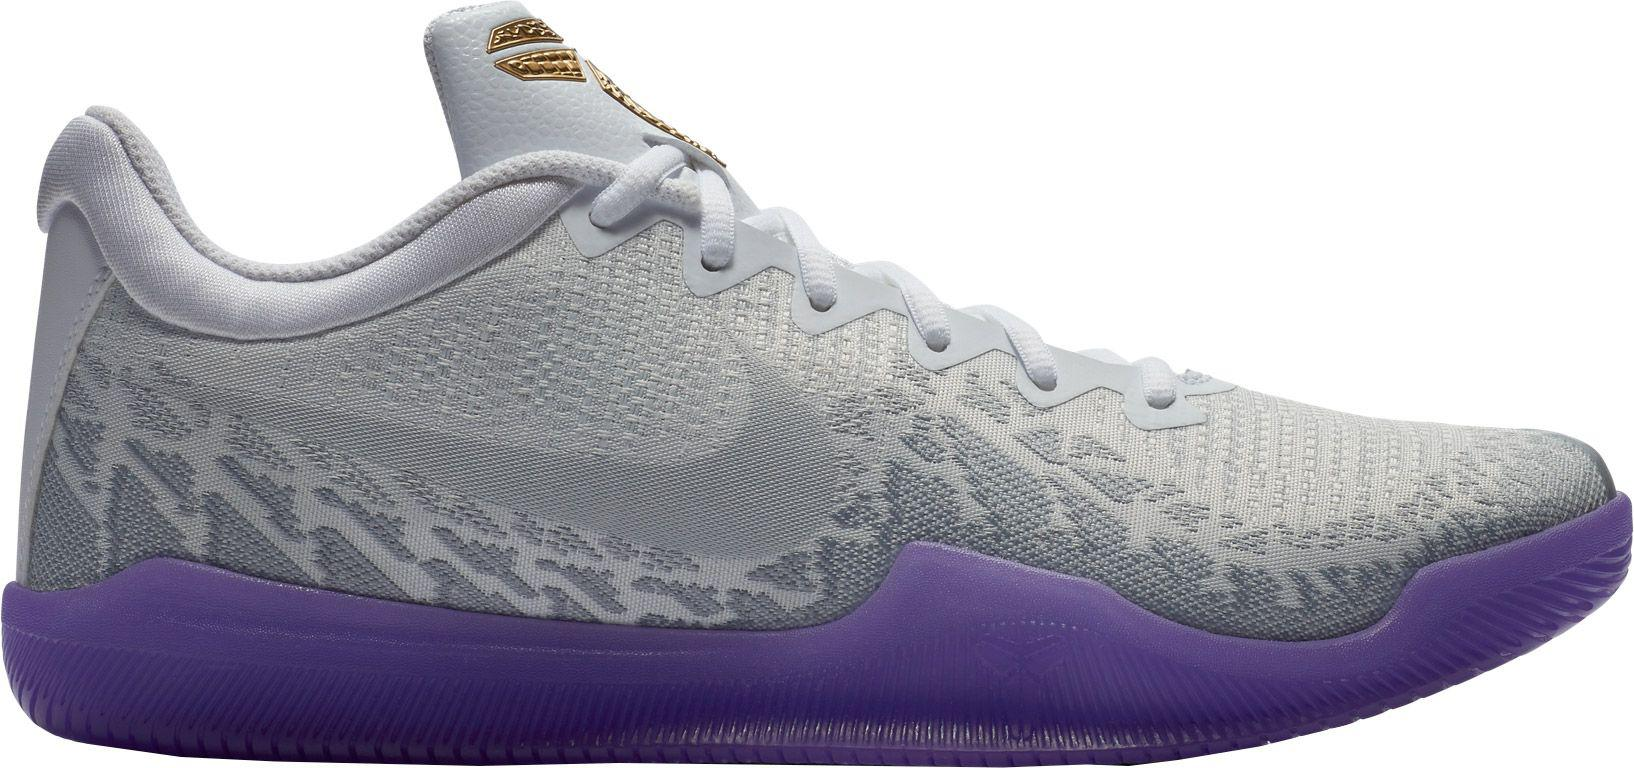 e4834fc3320 Nike - Multicolor Kobe Mamba Rage Basketball Shoes for Men - Lyst